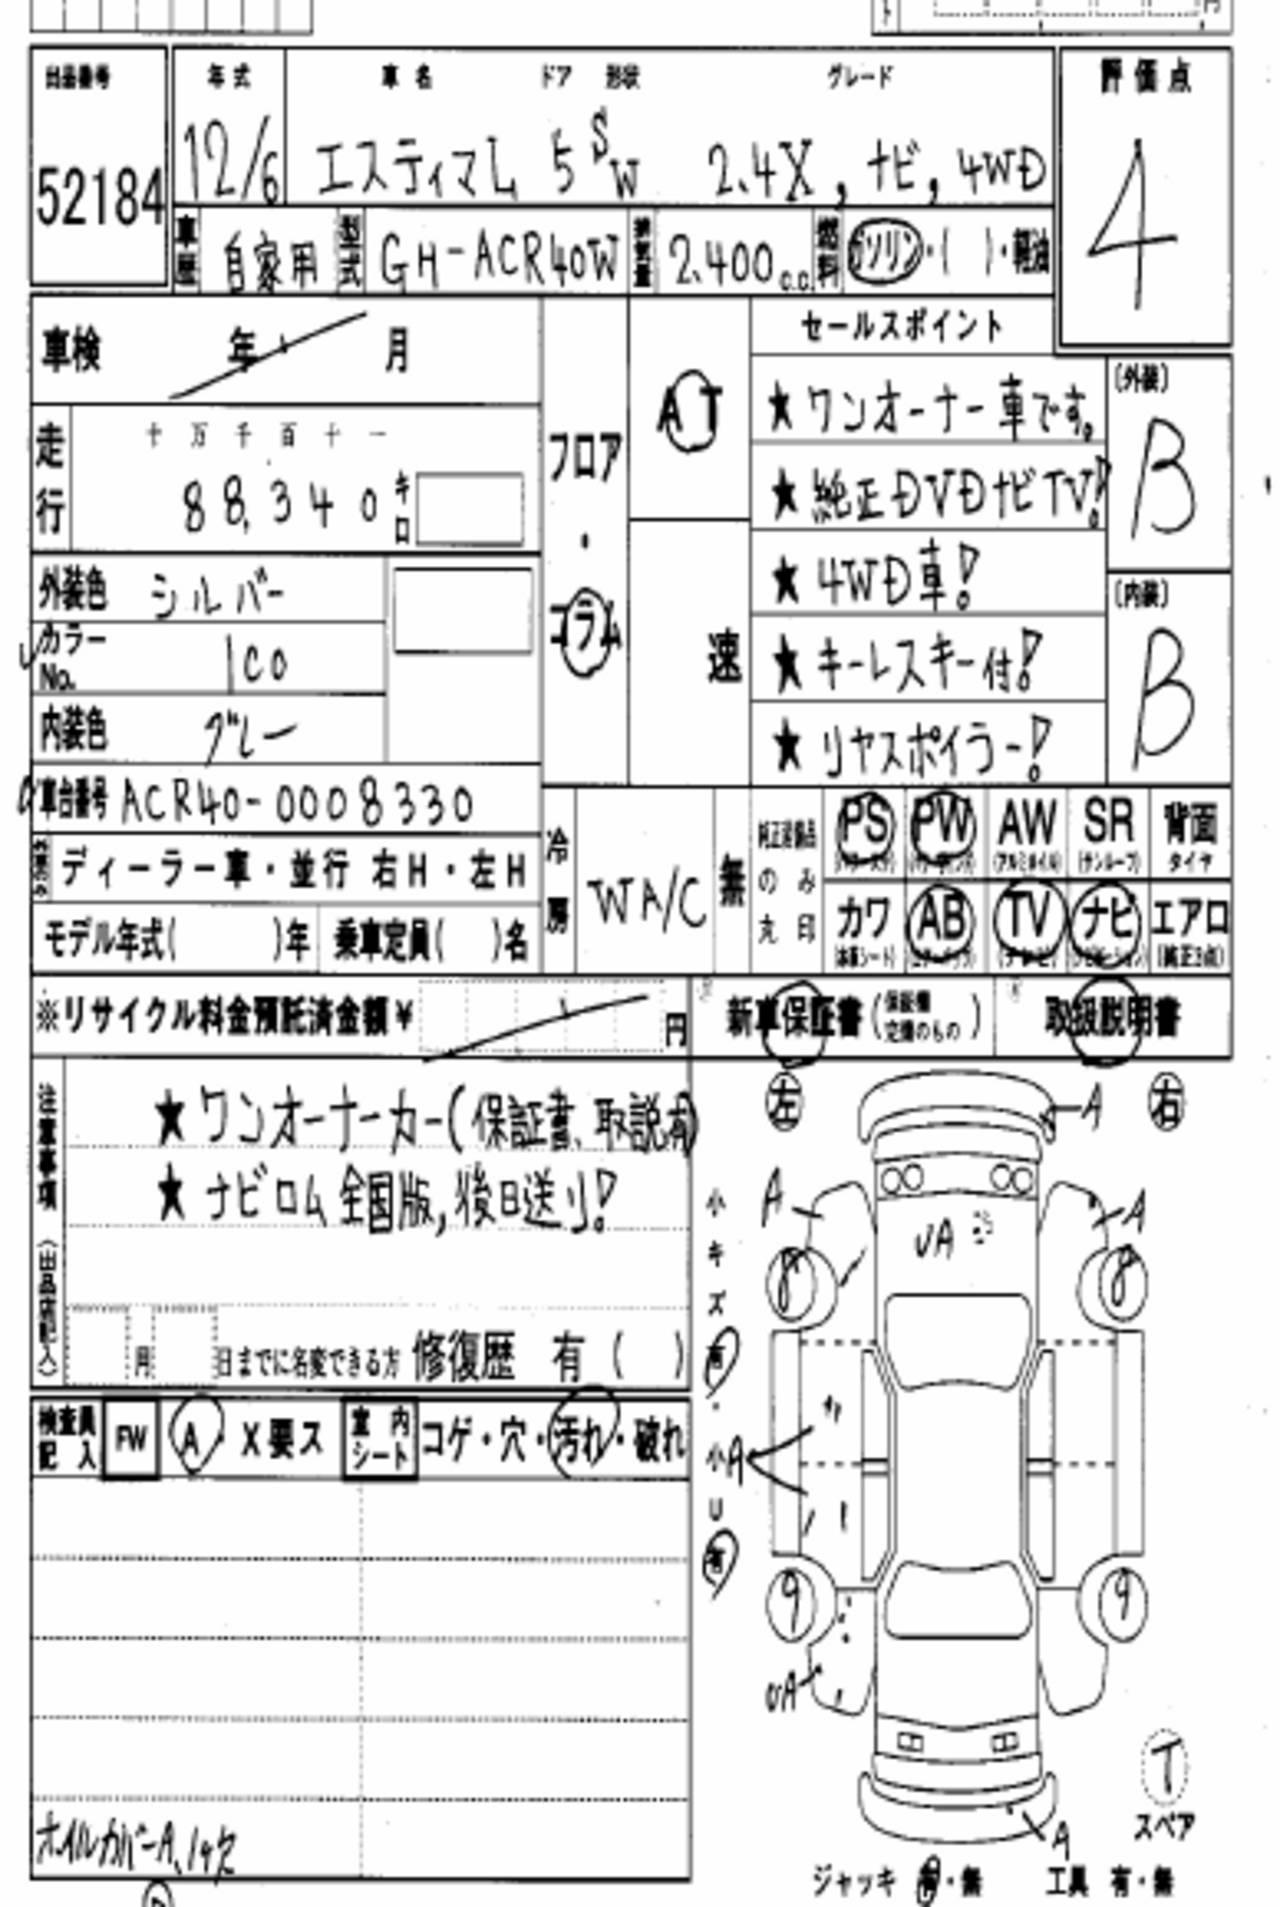 2000 Toyota Estima specs: mpg, towing capacity, size, photos